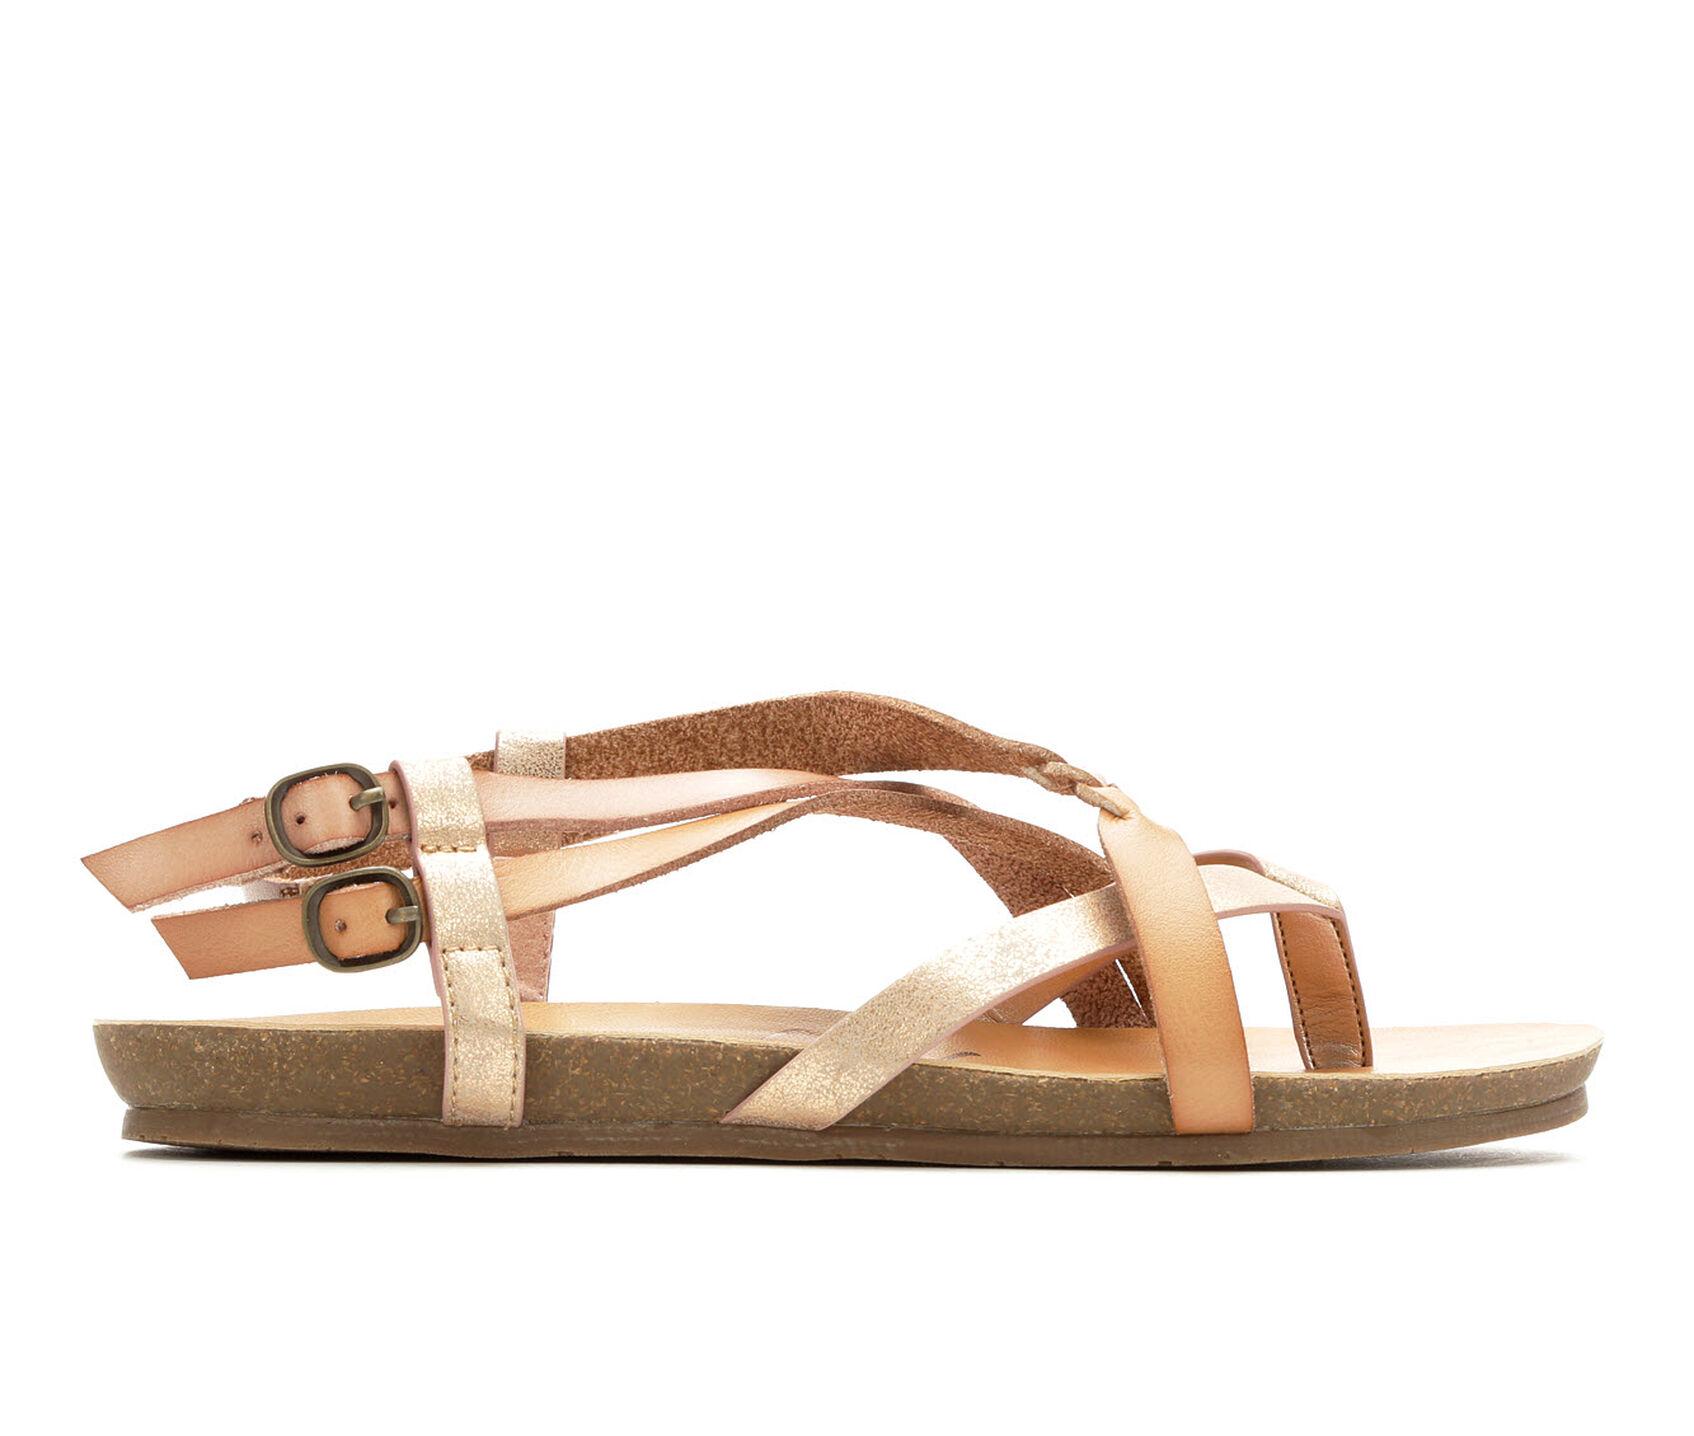 9c702cdb9a11e Women's Blowfish Malibu Gineh Strappy Footbed Sandals